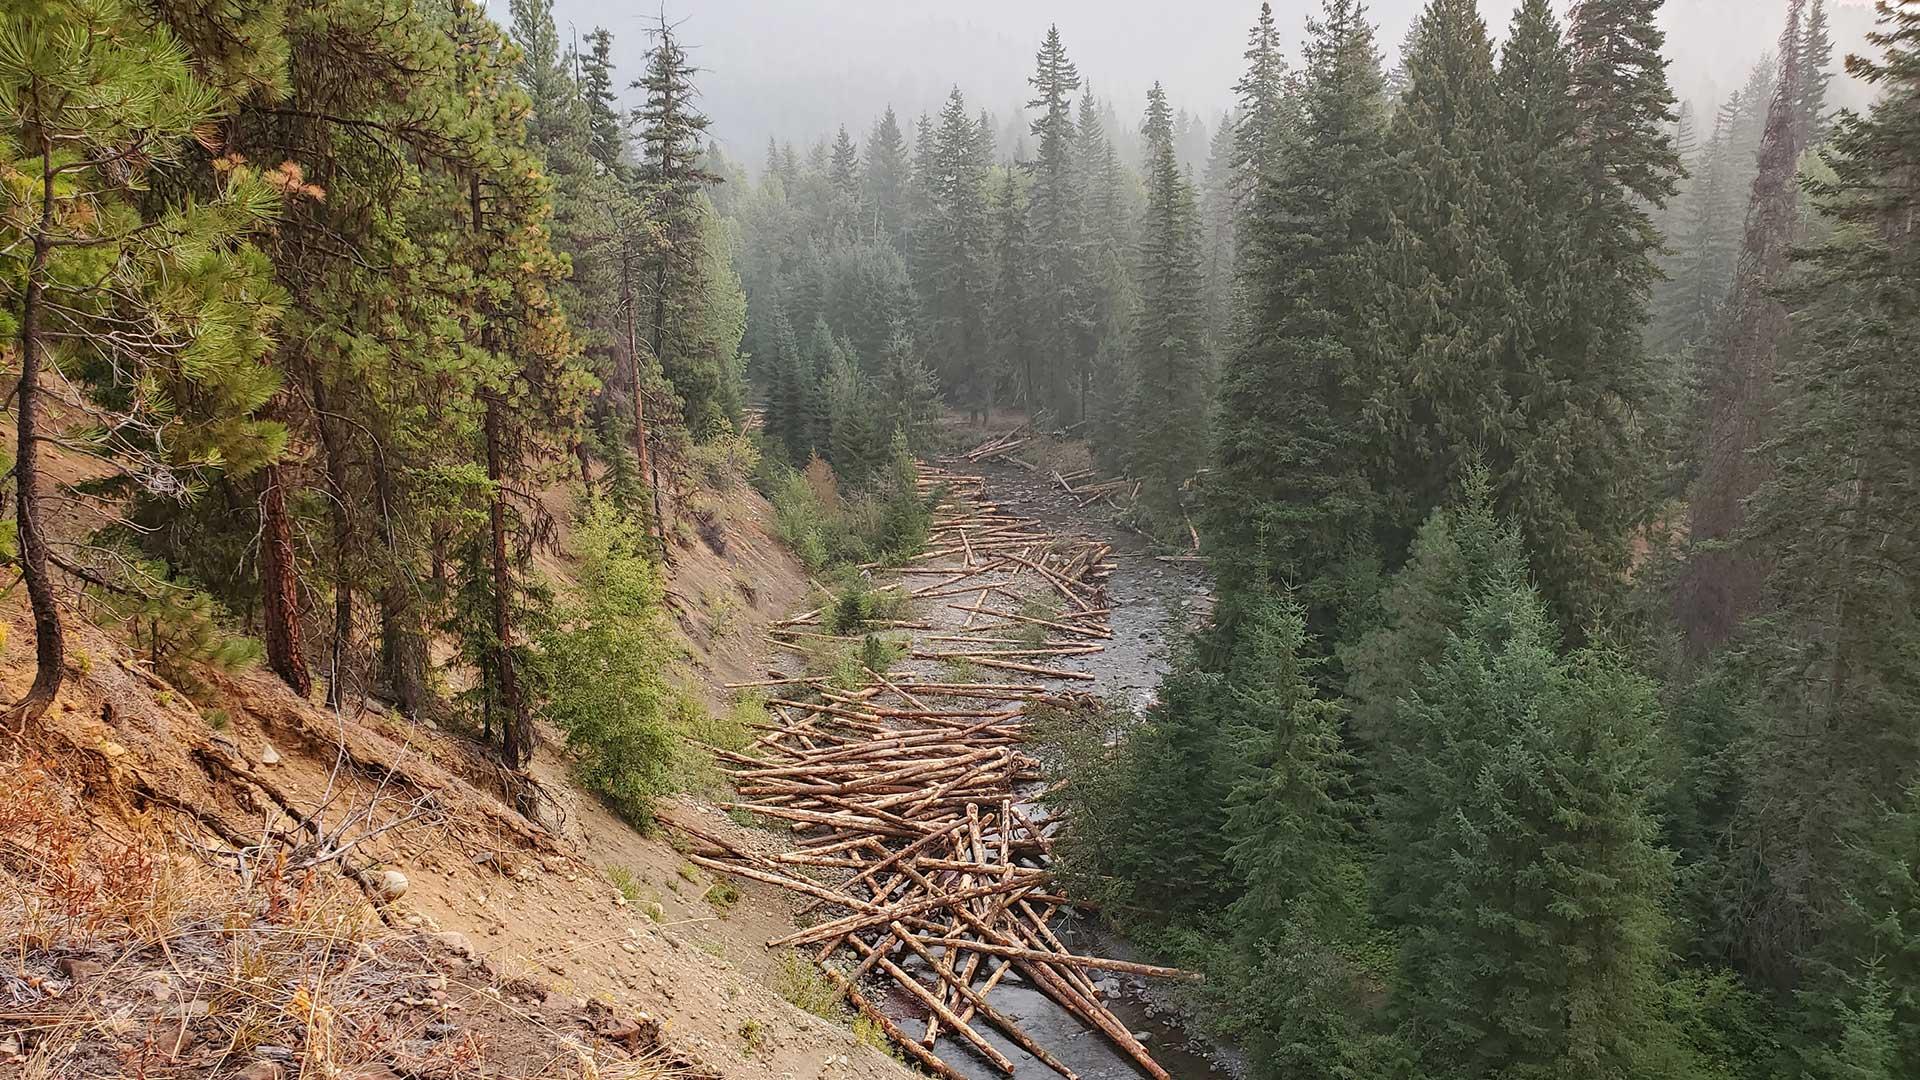 NF Teanaway Wood replenishment – Mid Columbia FEG